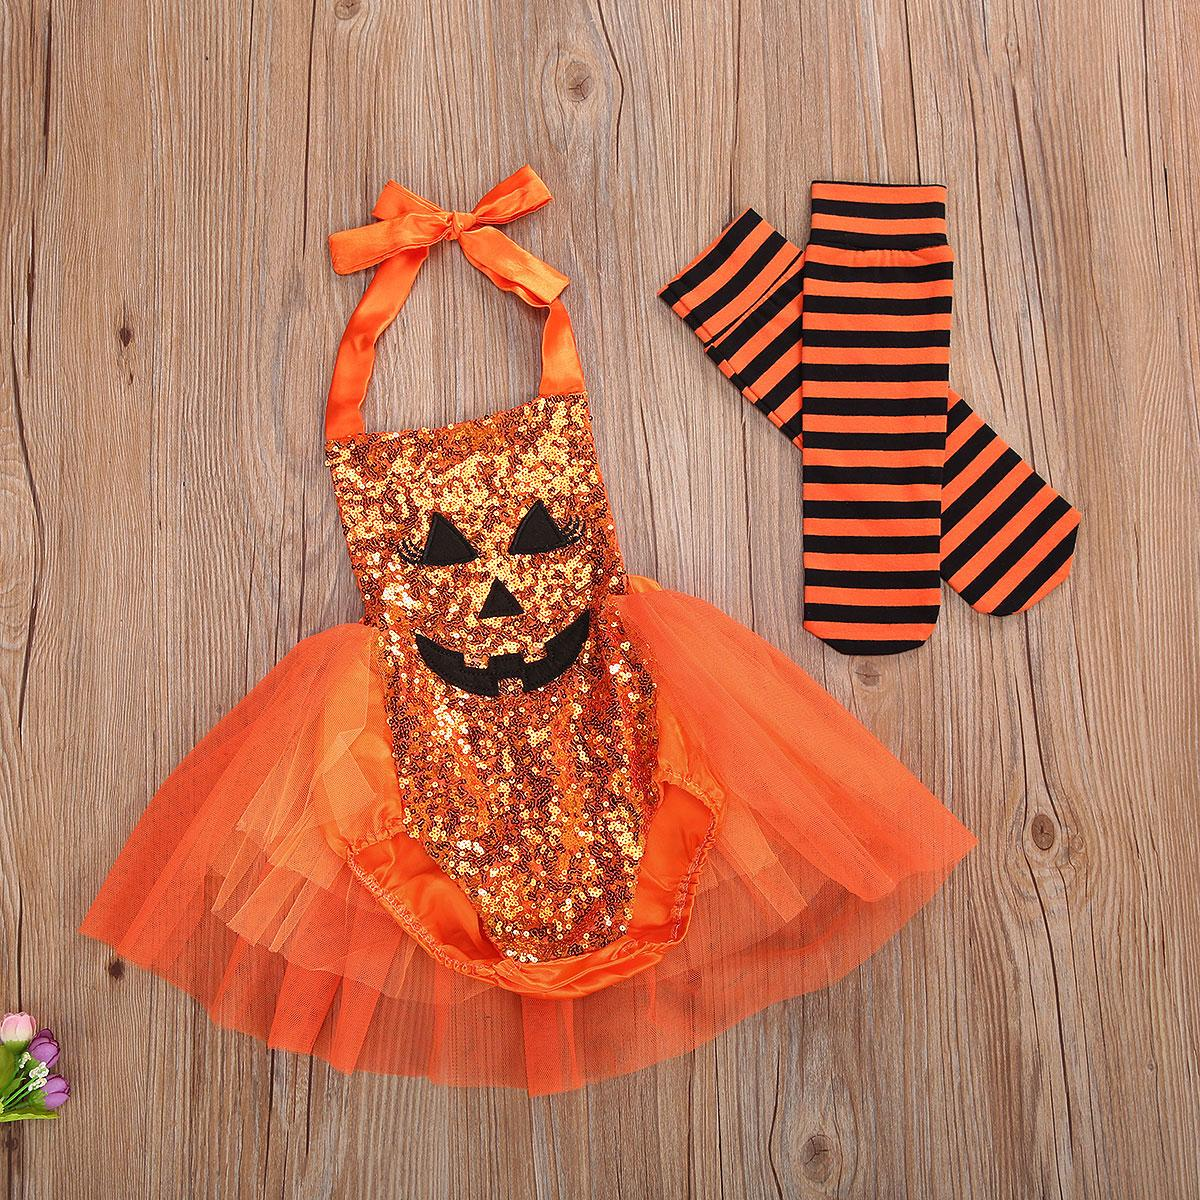 Baby Halloween Kürbis Gesicht Pailletten Halfter Romper Girls Tutu Kleid + Neugeborene Gestreifte Socken Infant 2 stücke Set Festival Outfits